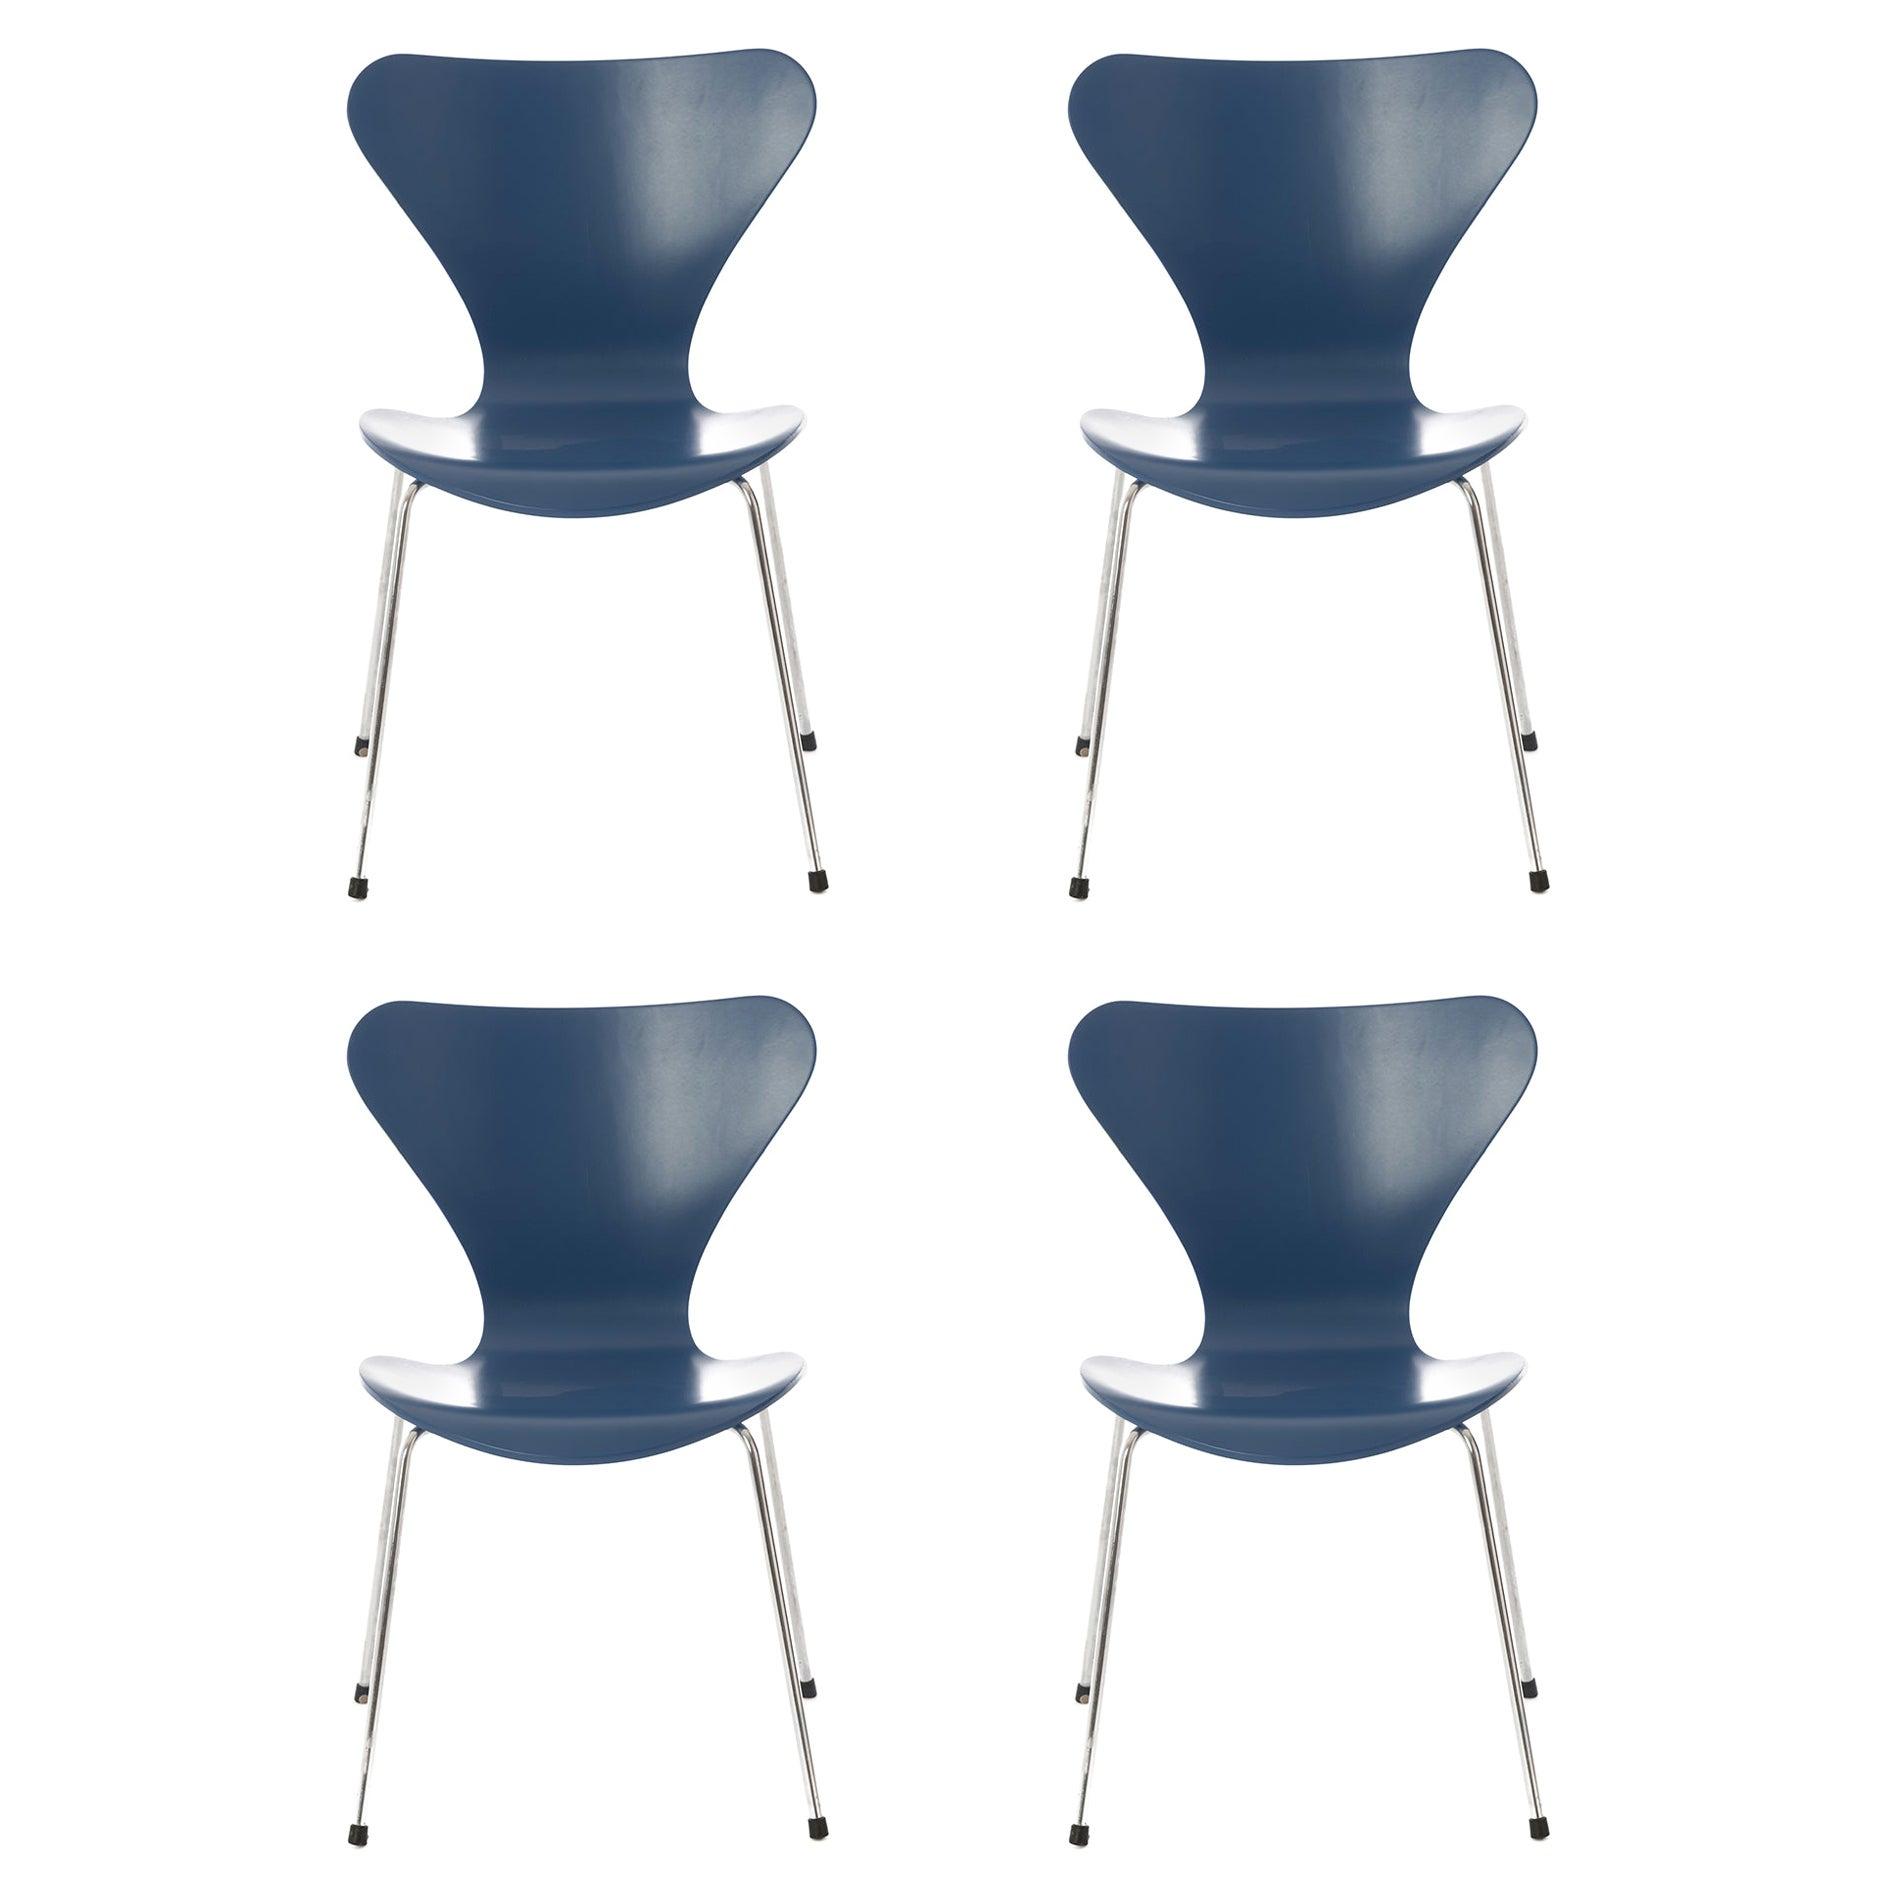 Danish Modern Original Series 7 Chairs by Arne Jacobsen, Set of 4